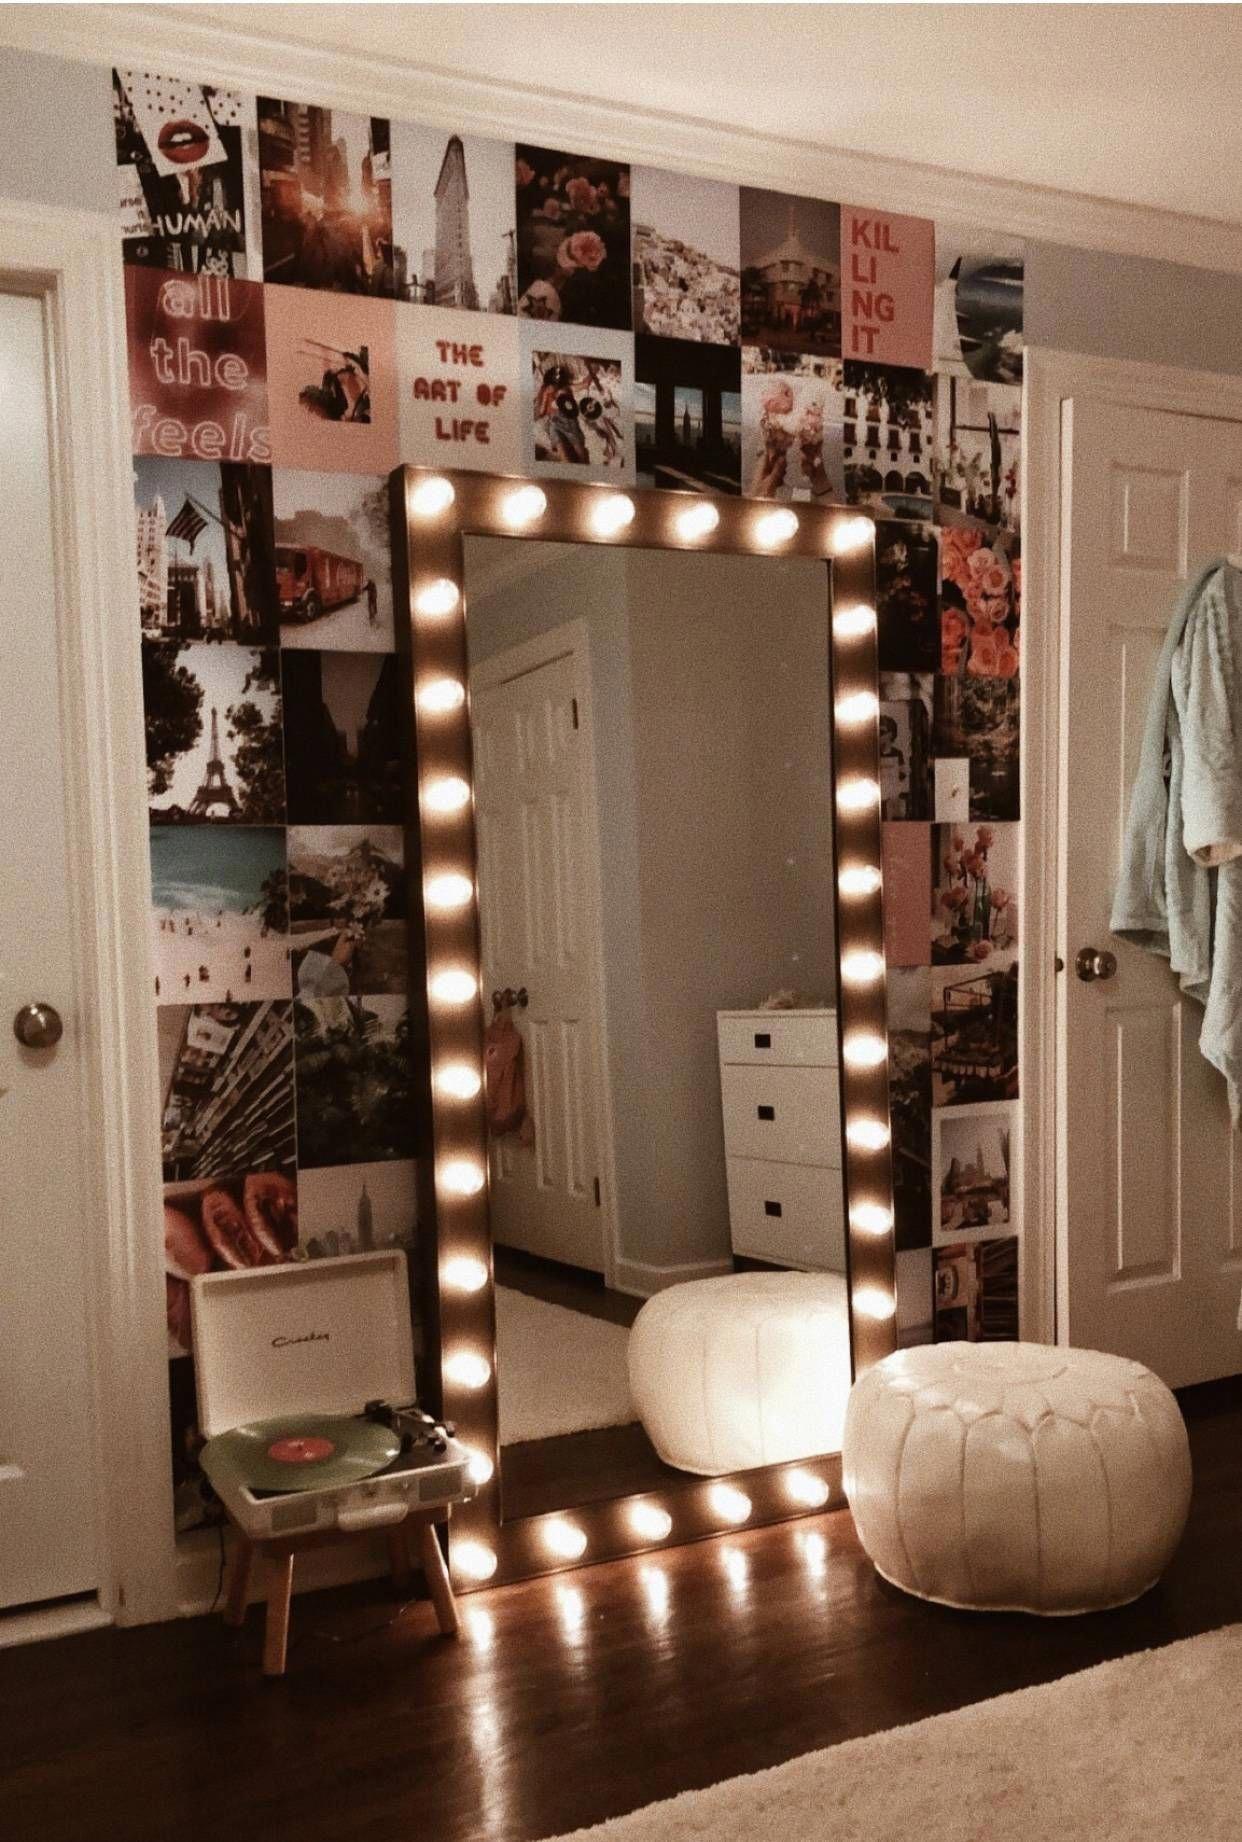 Vsco Decor Ideas - Must Have Decor for a Vsco Room - The Pink Dream